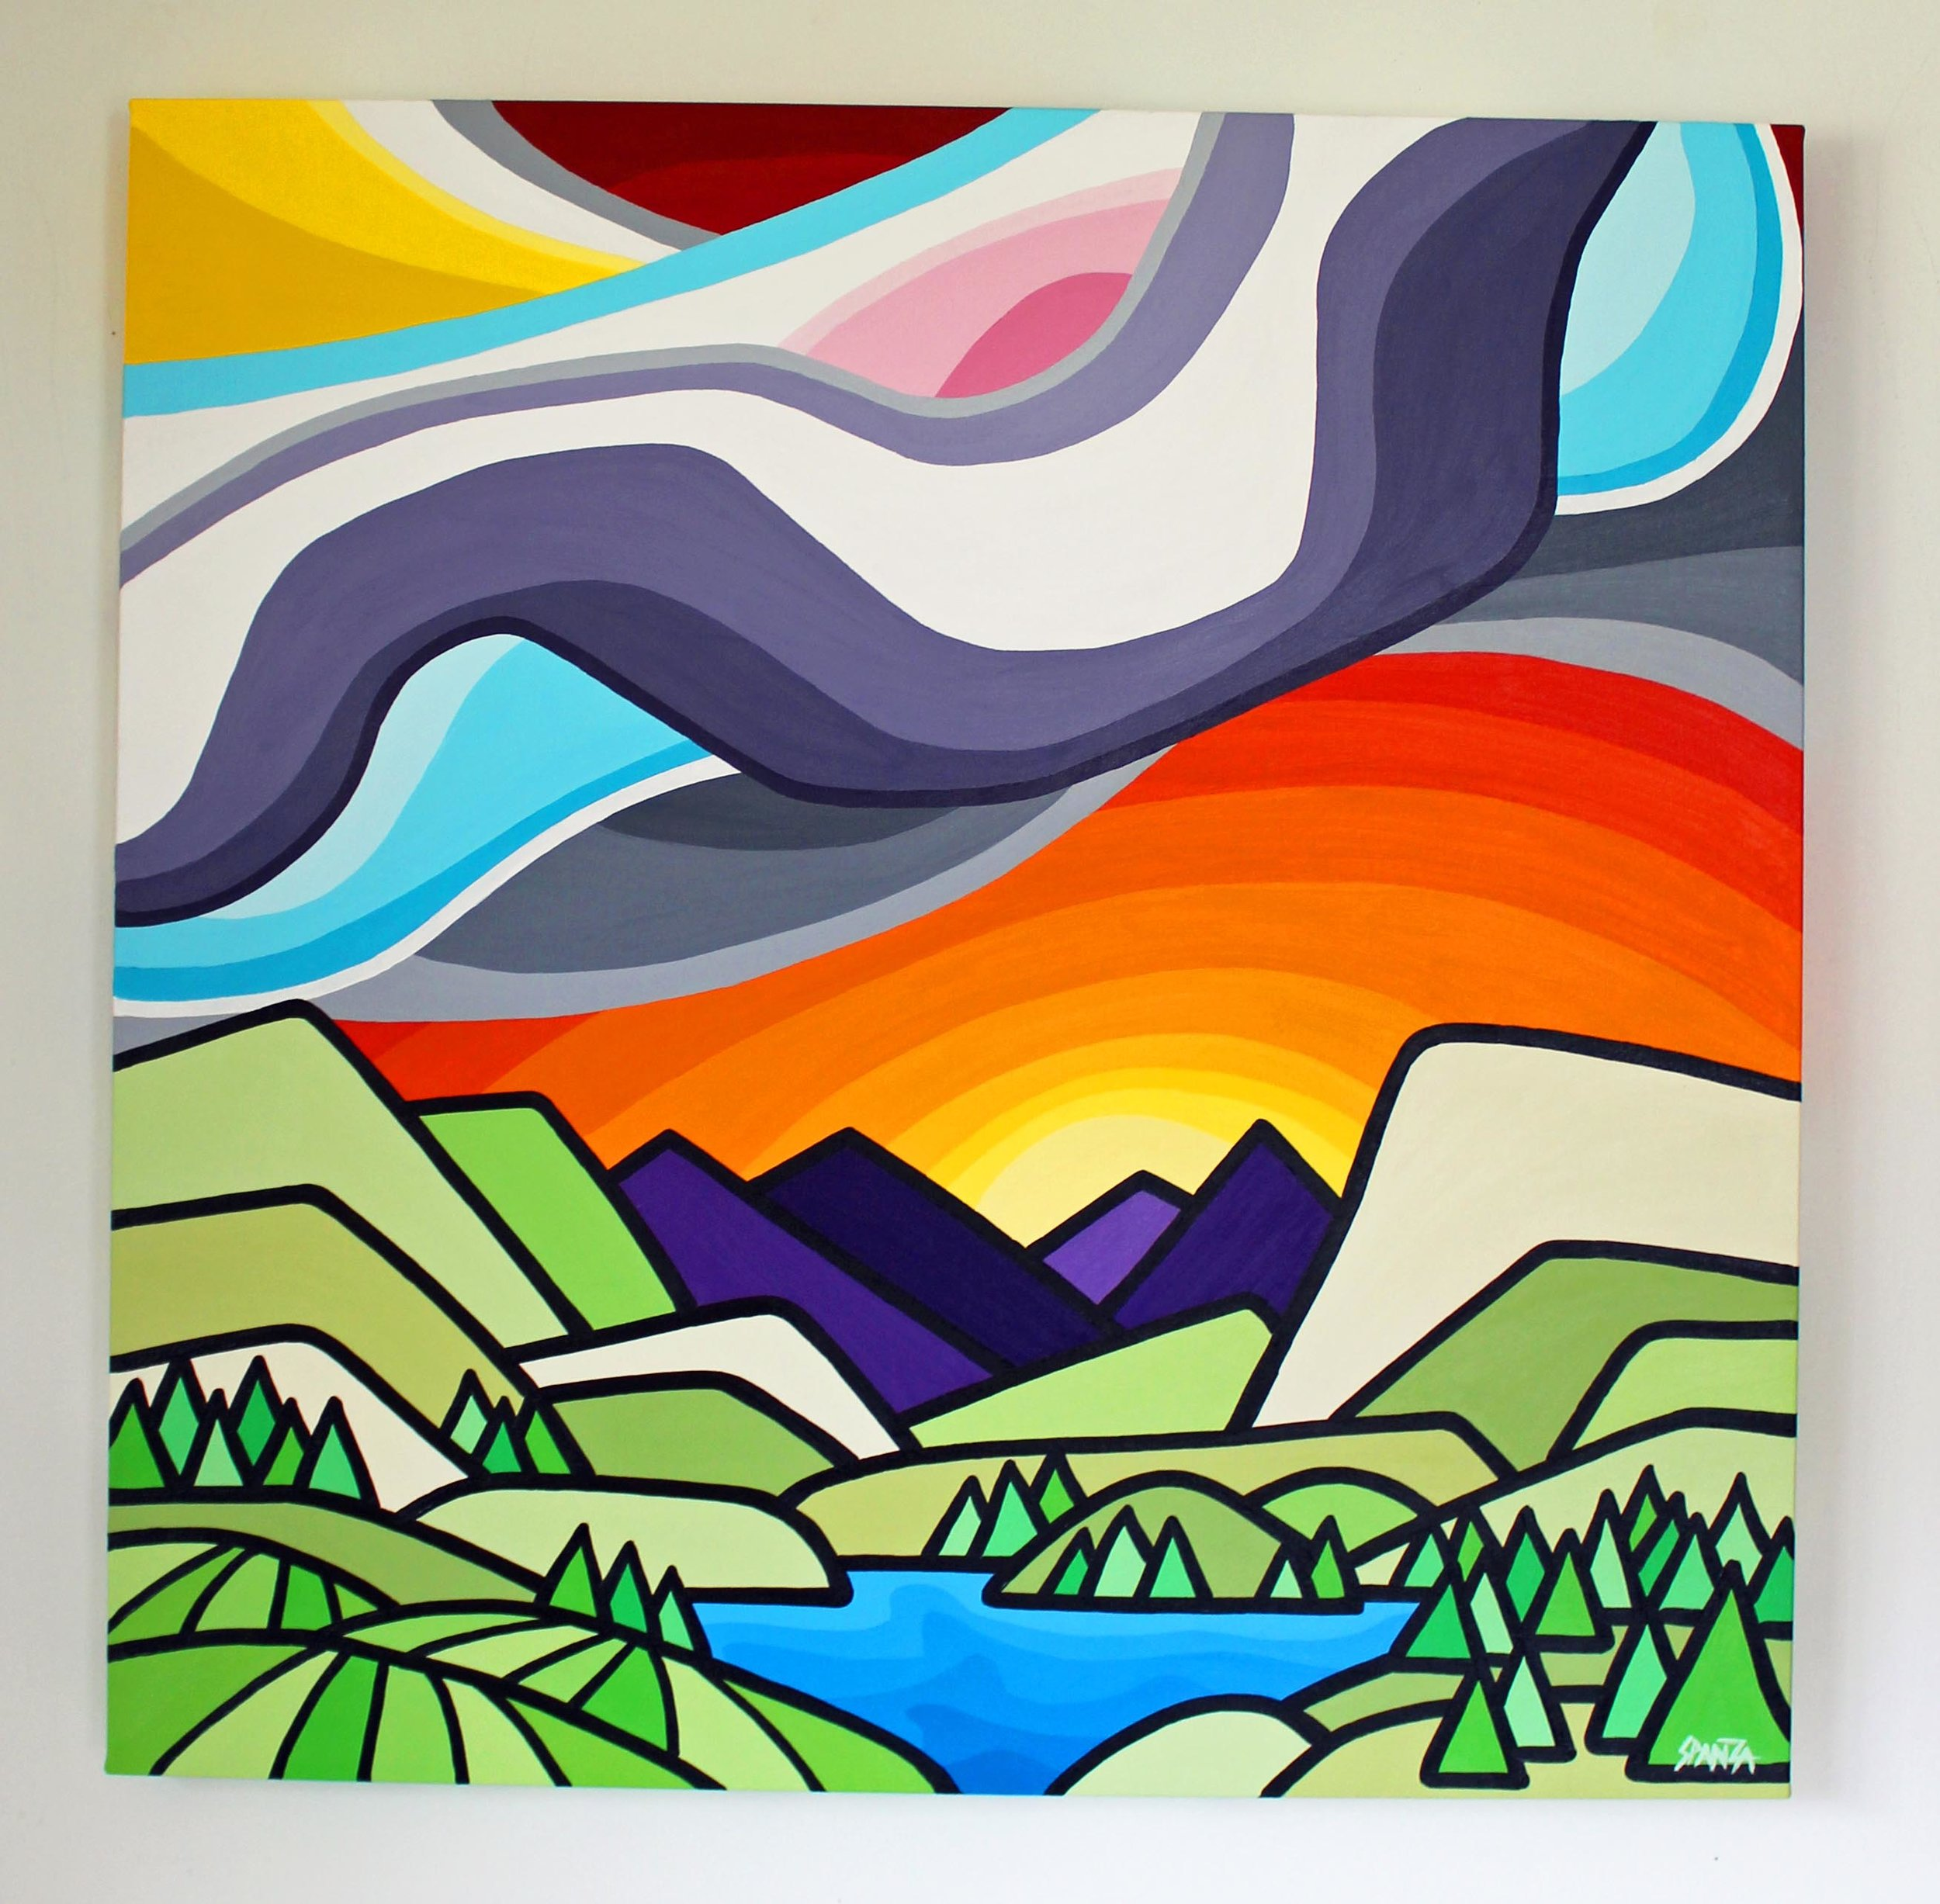 "Vaseux Lake - Size: 30"" x 30"" acrylic on canvasPrice: SOLD"